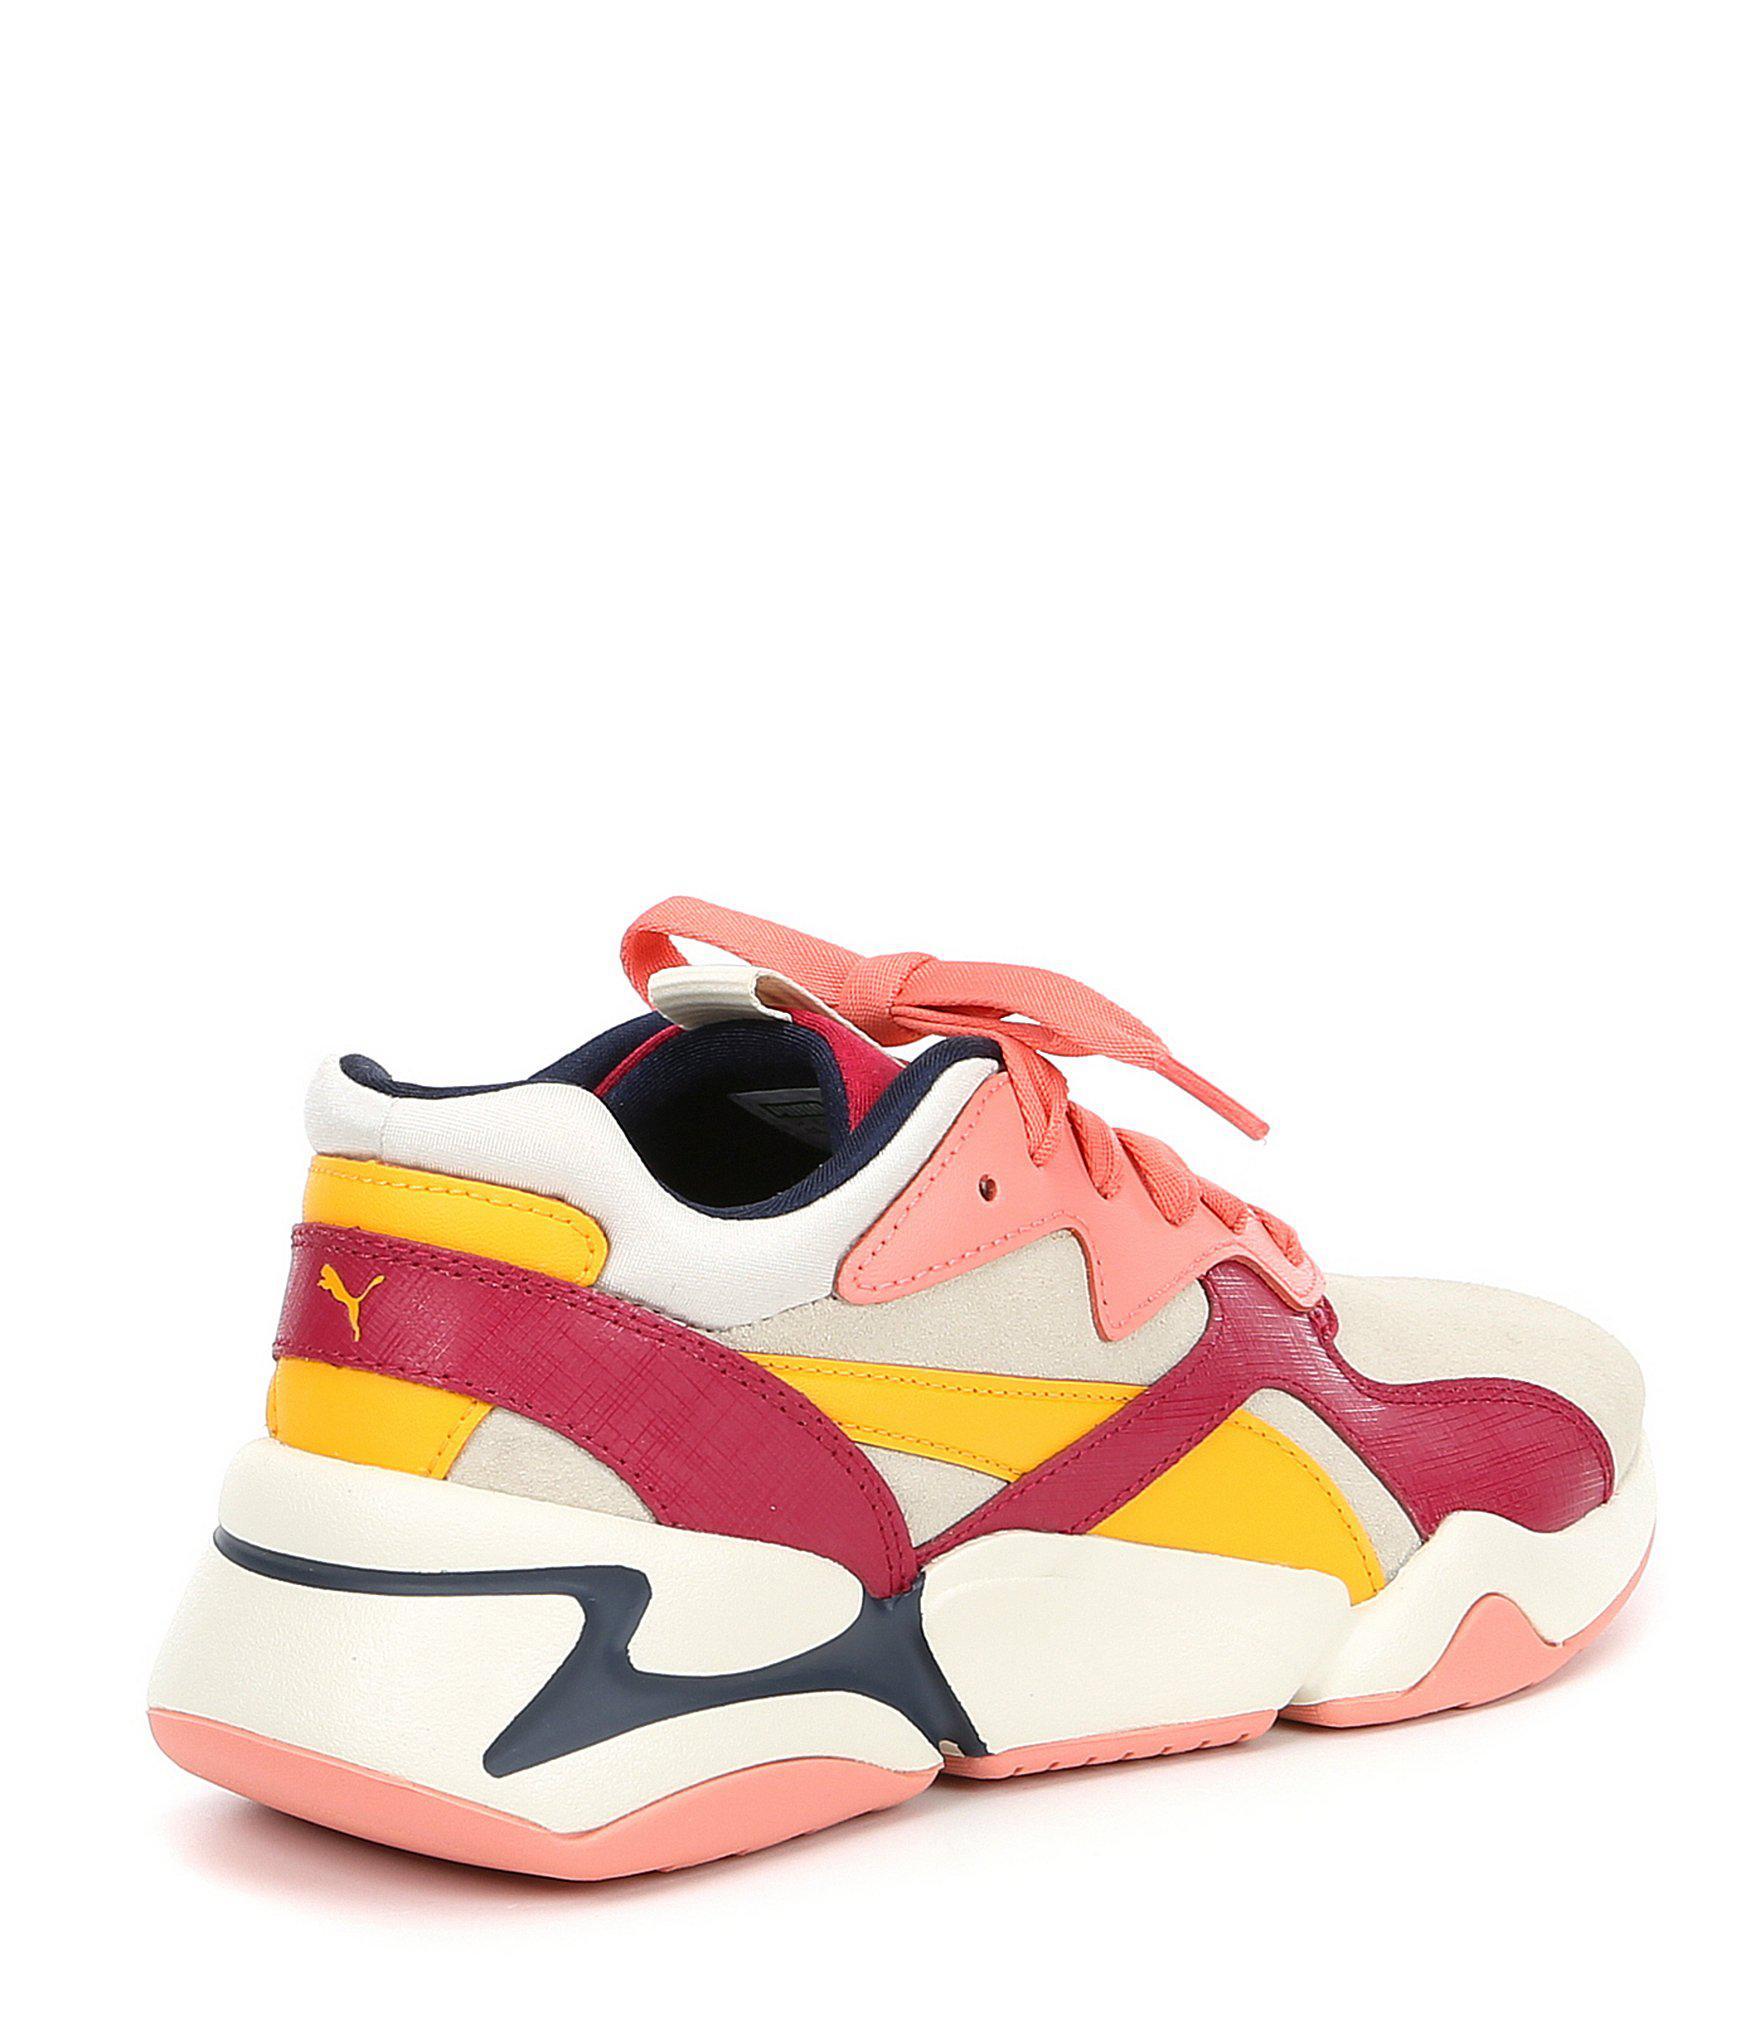 64c00c5ba19b PUMA - White Women s Nova Colorblocked Sneakers - Lyst. View fullscreen